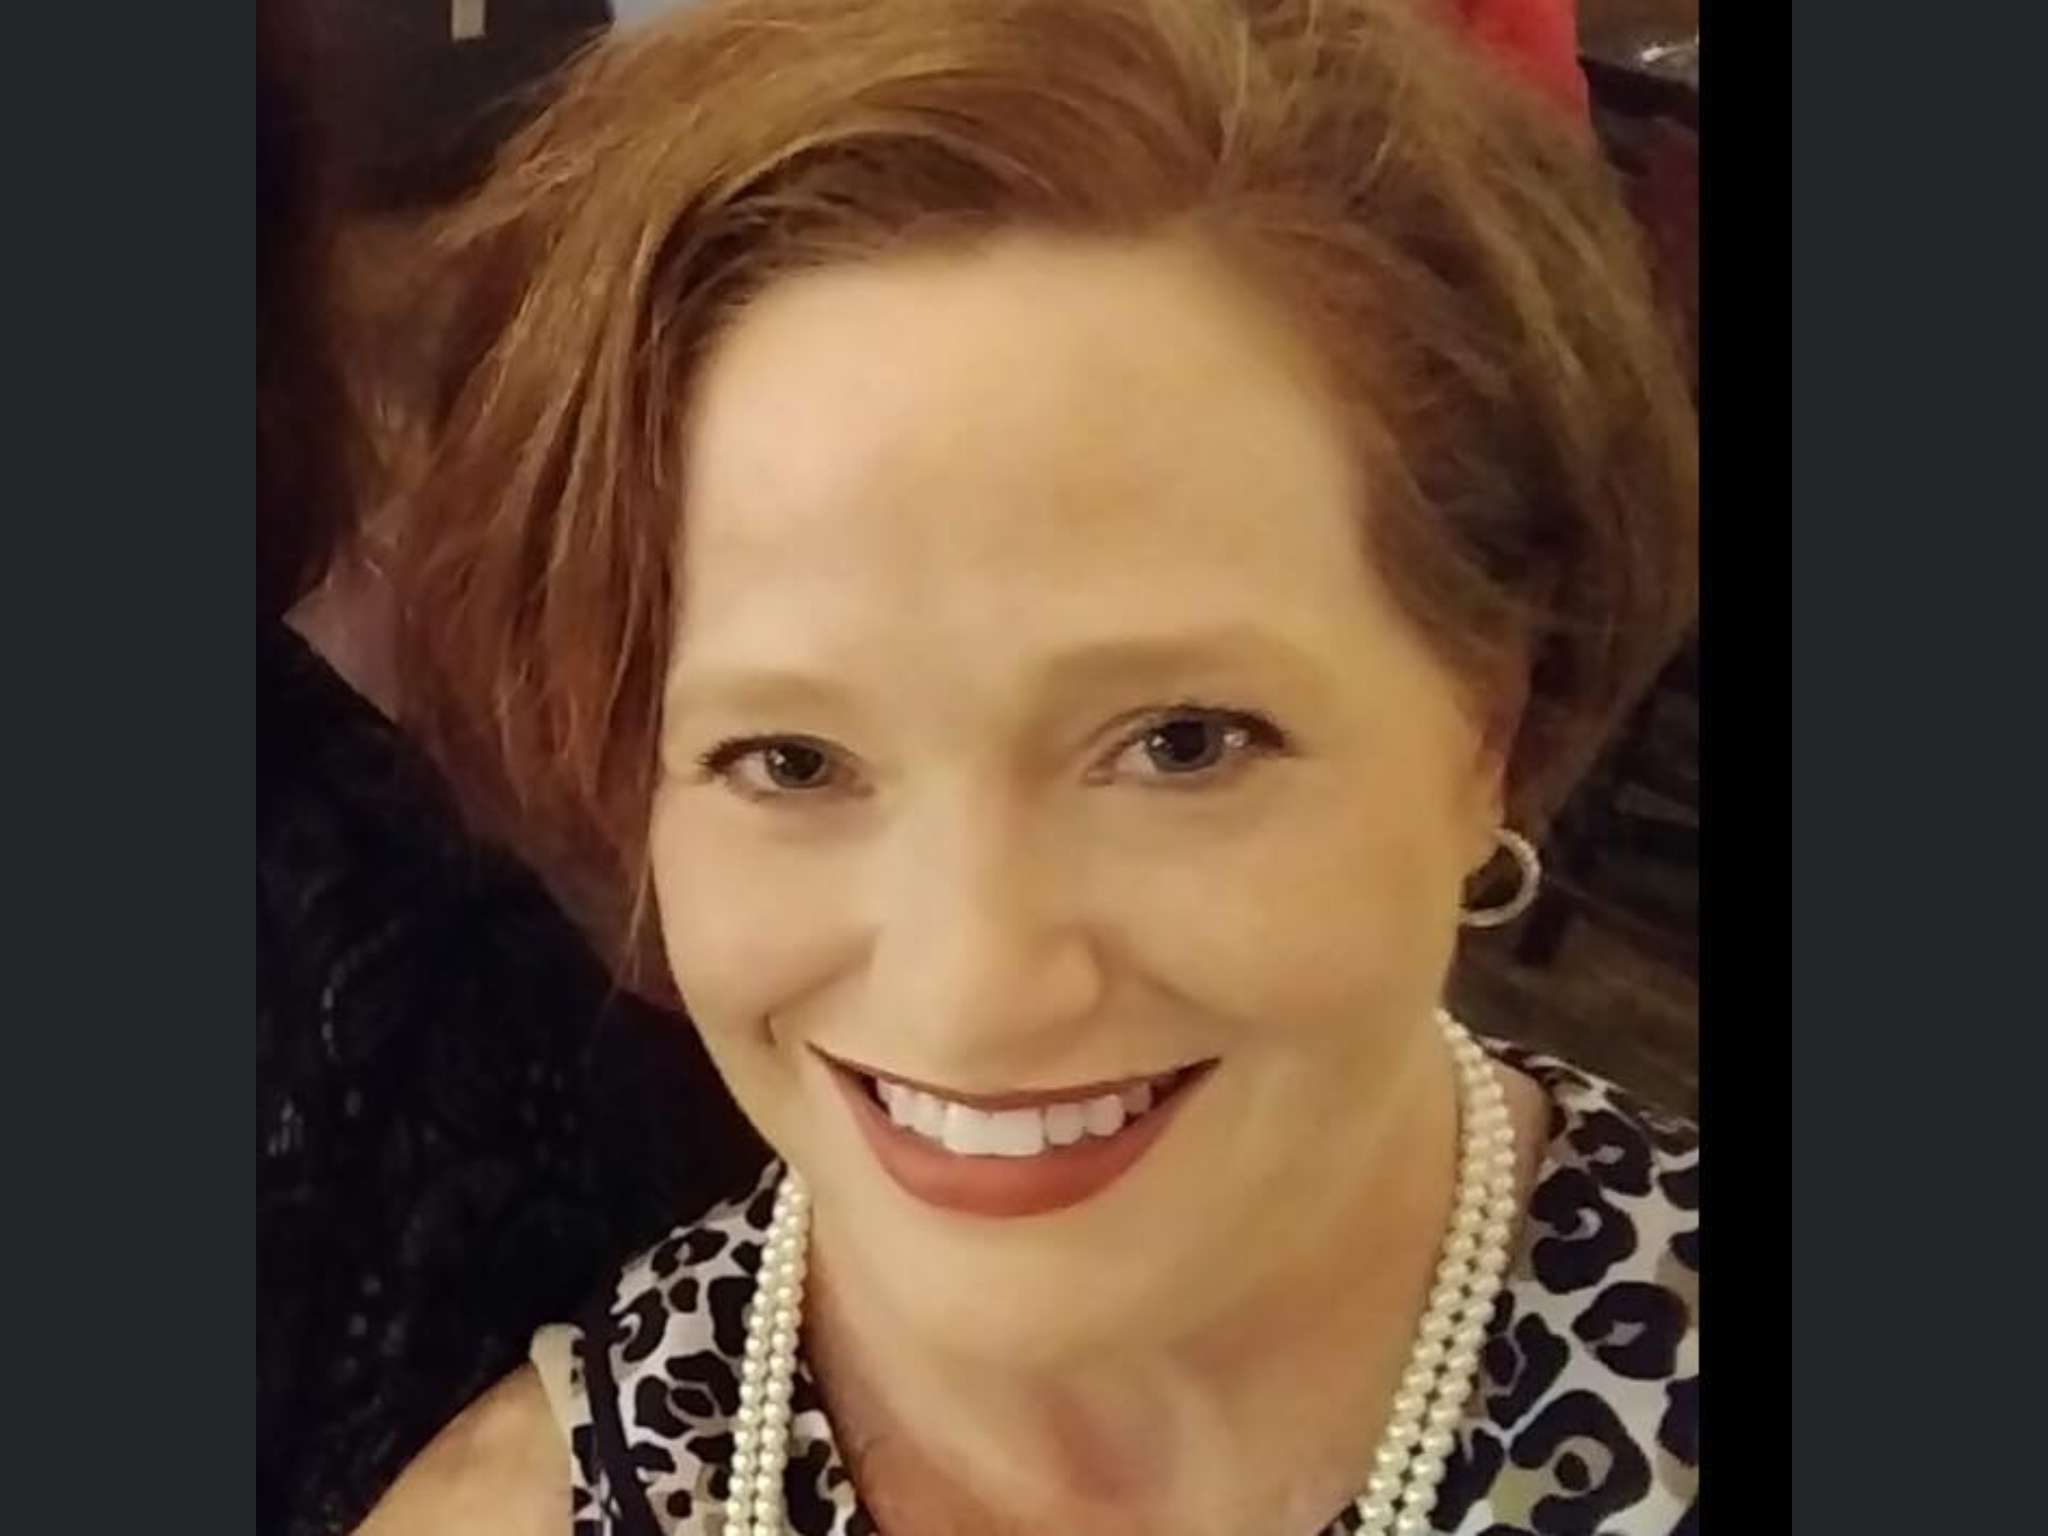 Angela Gray